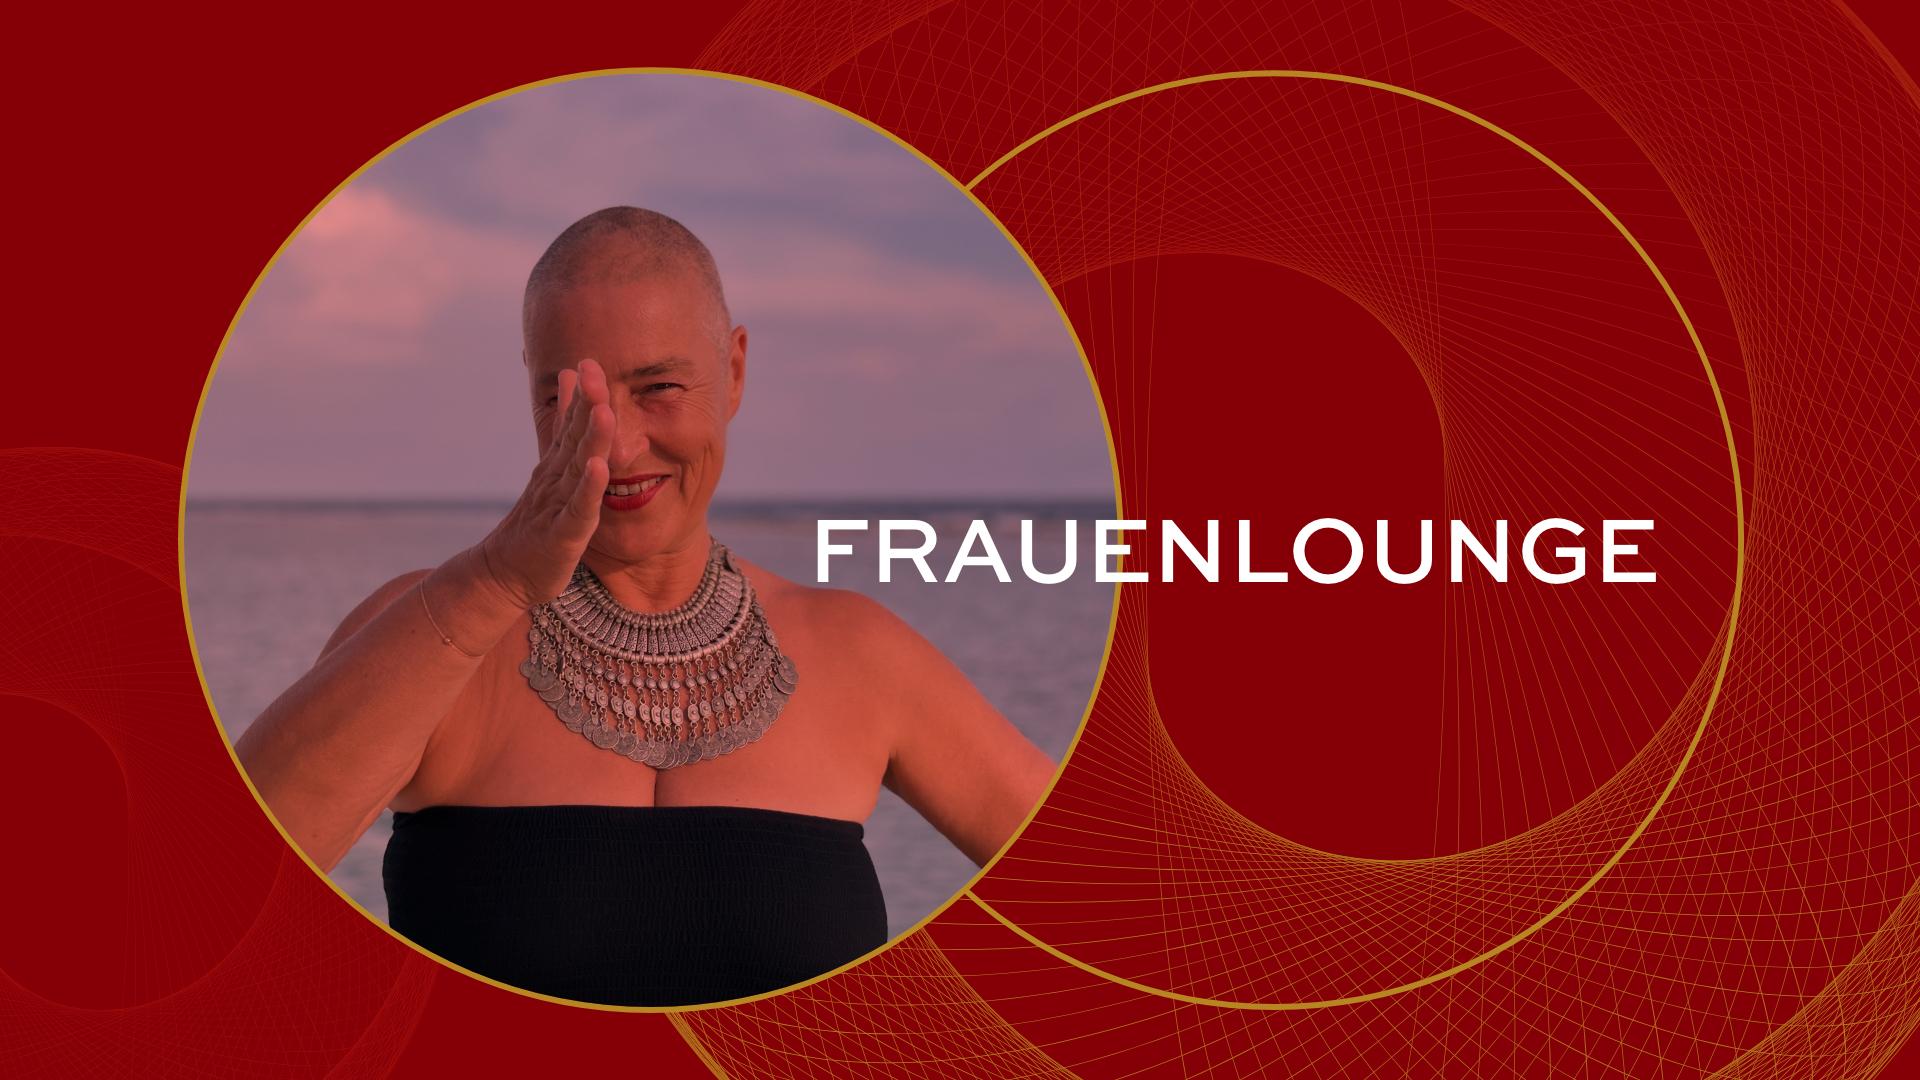 frauenlounge-1920x1080-new